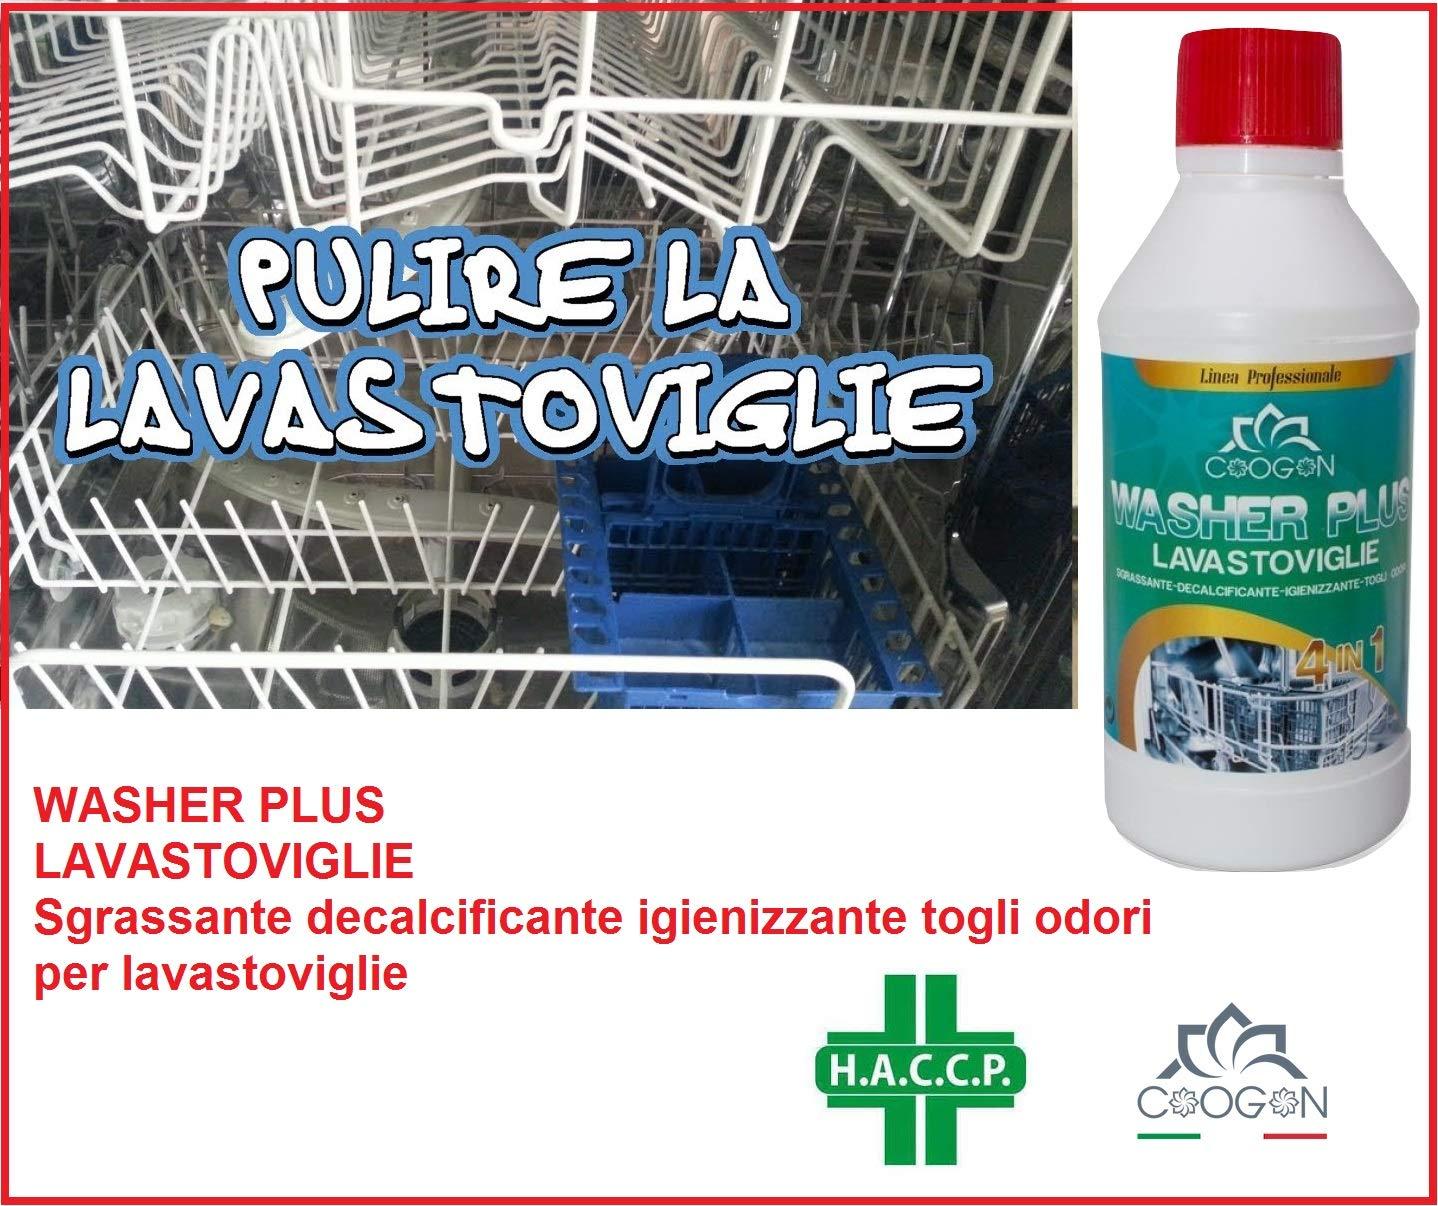 Chogan Washer Plus lavavajilla (300 gr) Concentrado Profesional ...